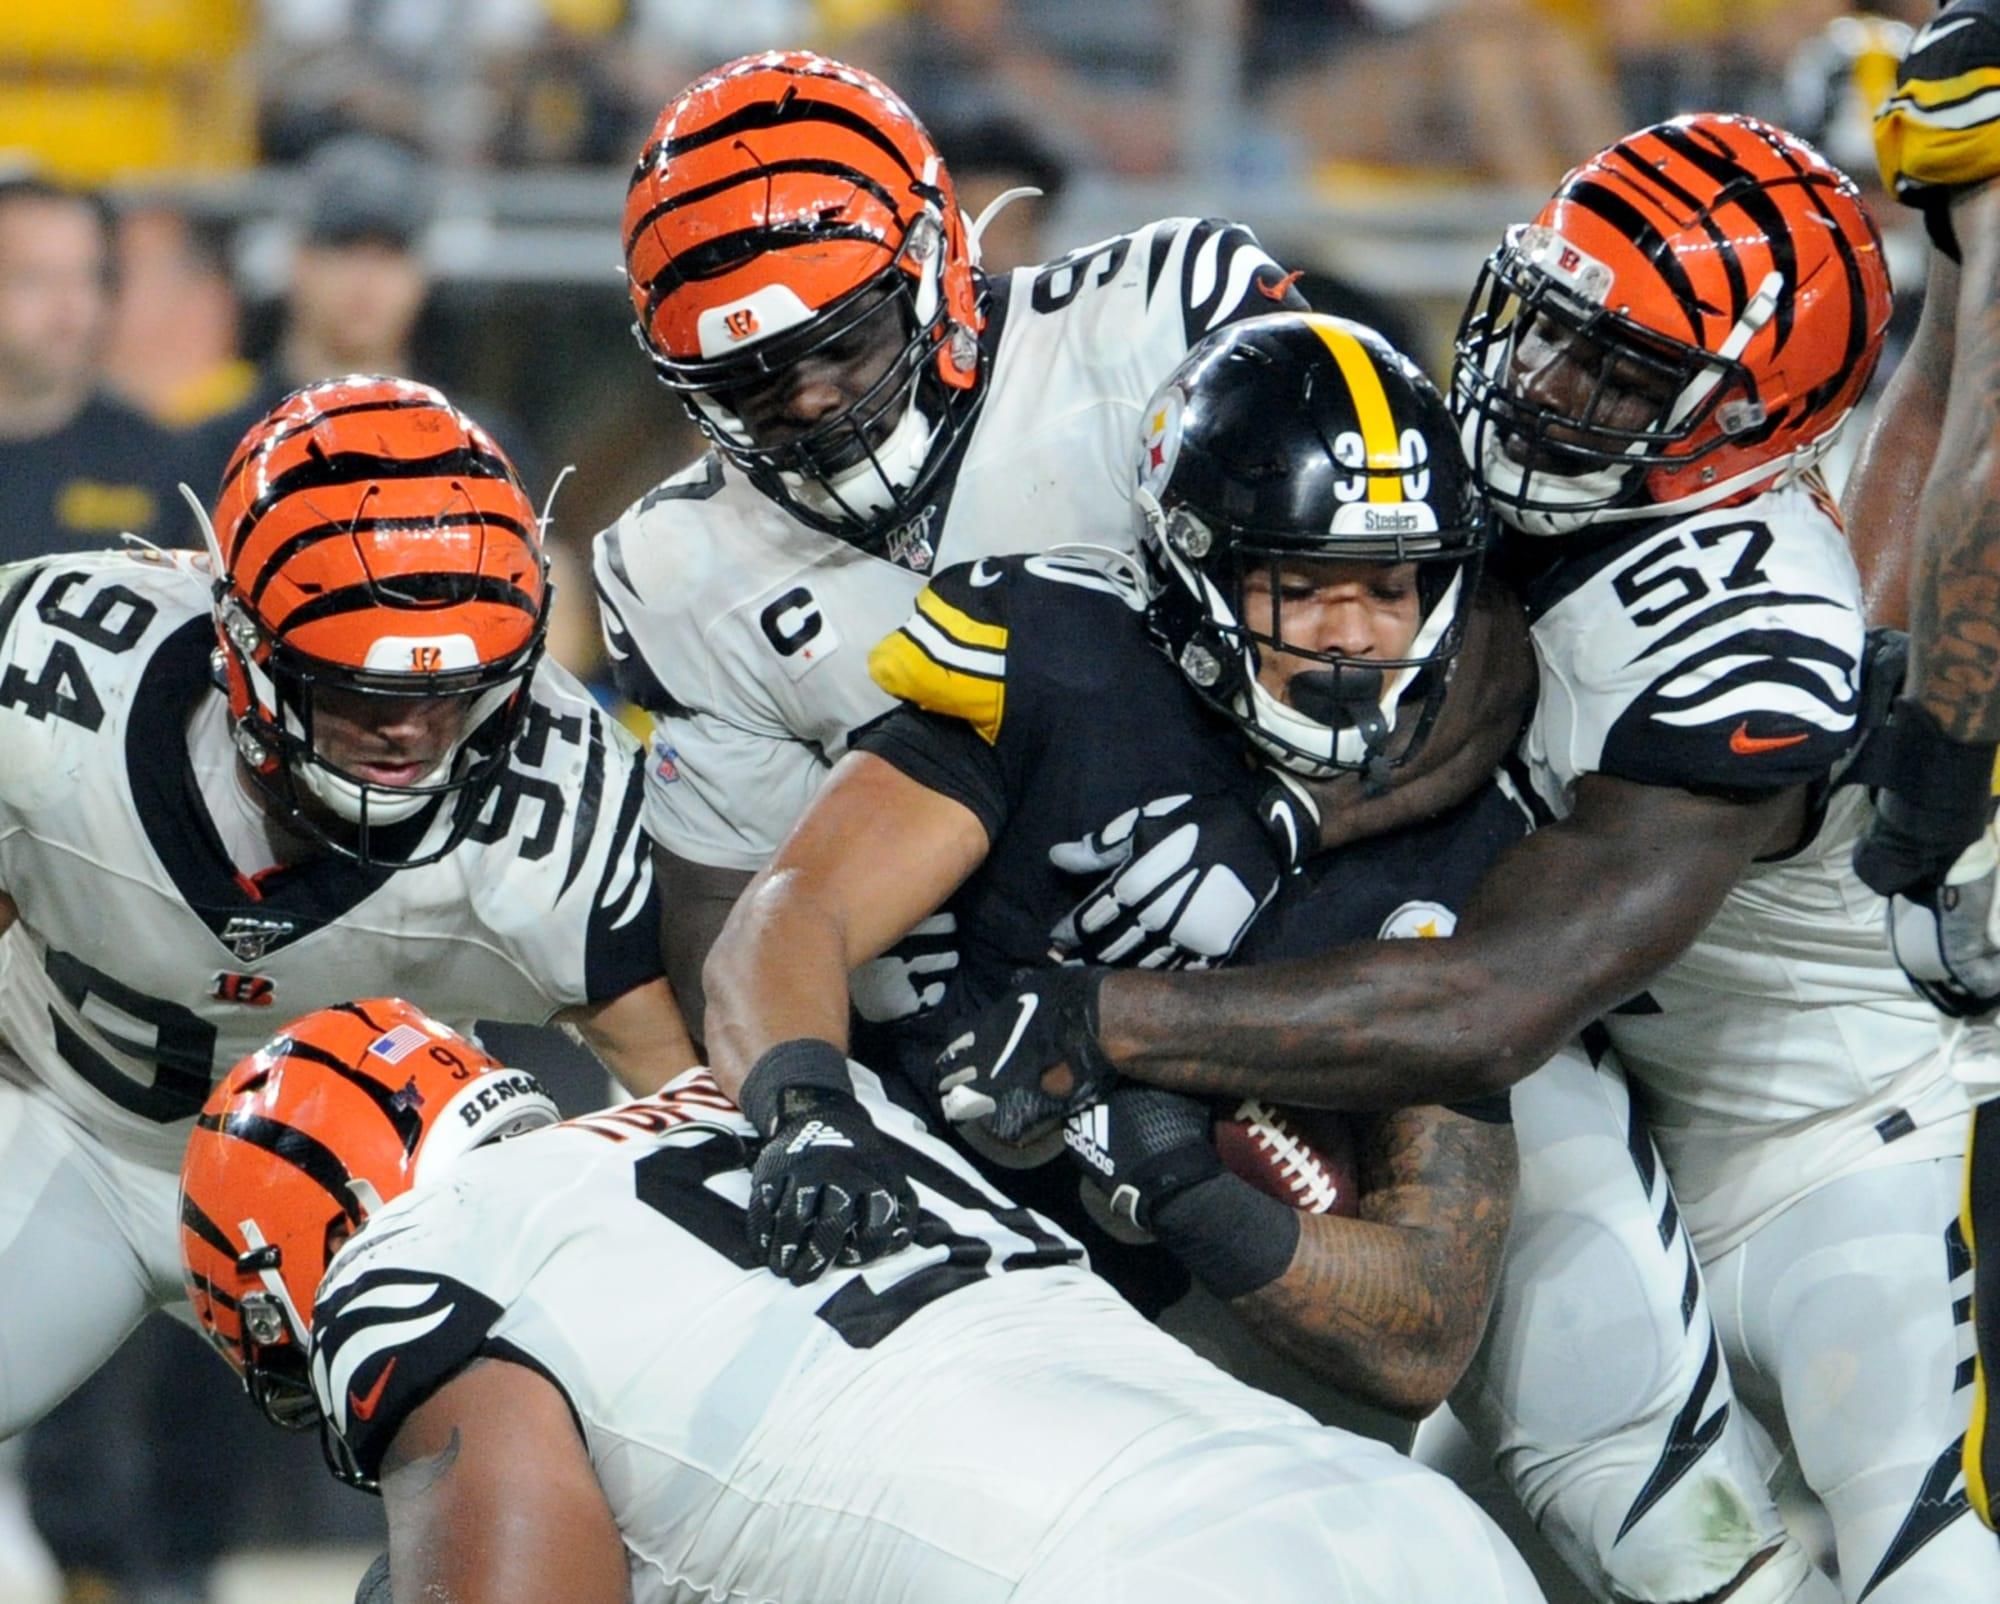 Steelers vs bengals betting line how to buy bitcoins 2021 nfl